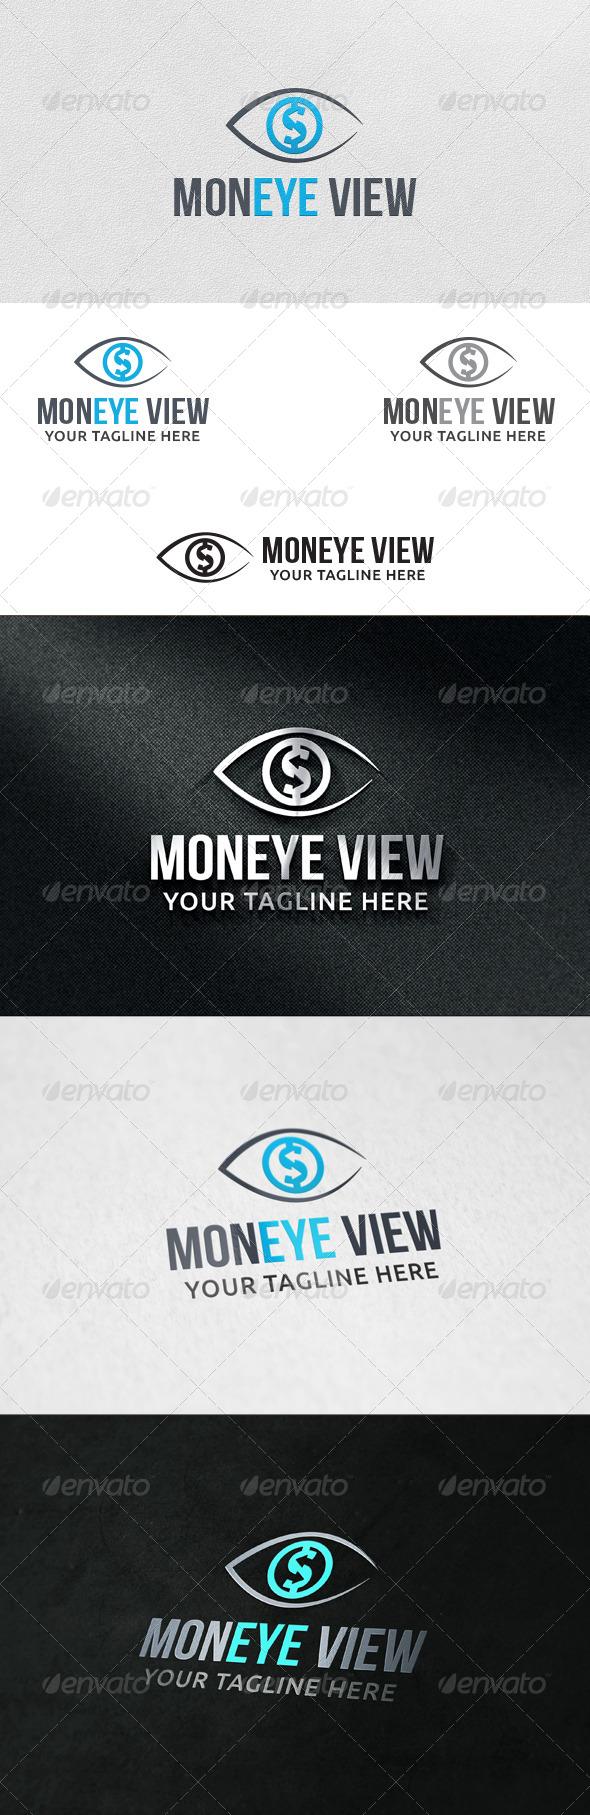 Money View - Logo Template - Symbols Logo Templates